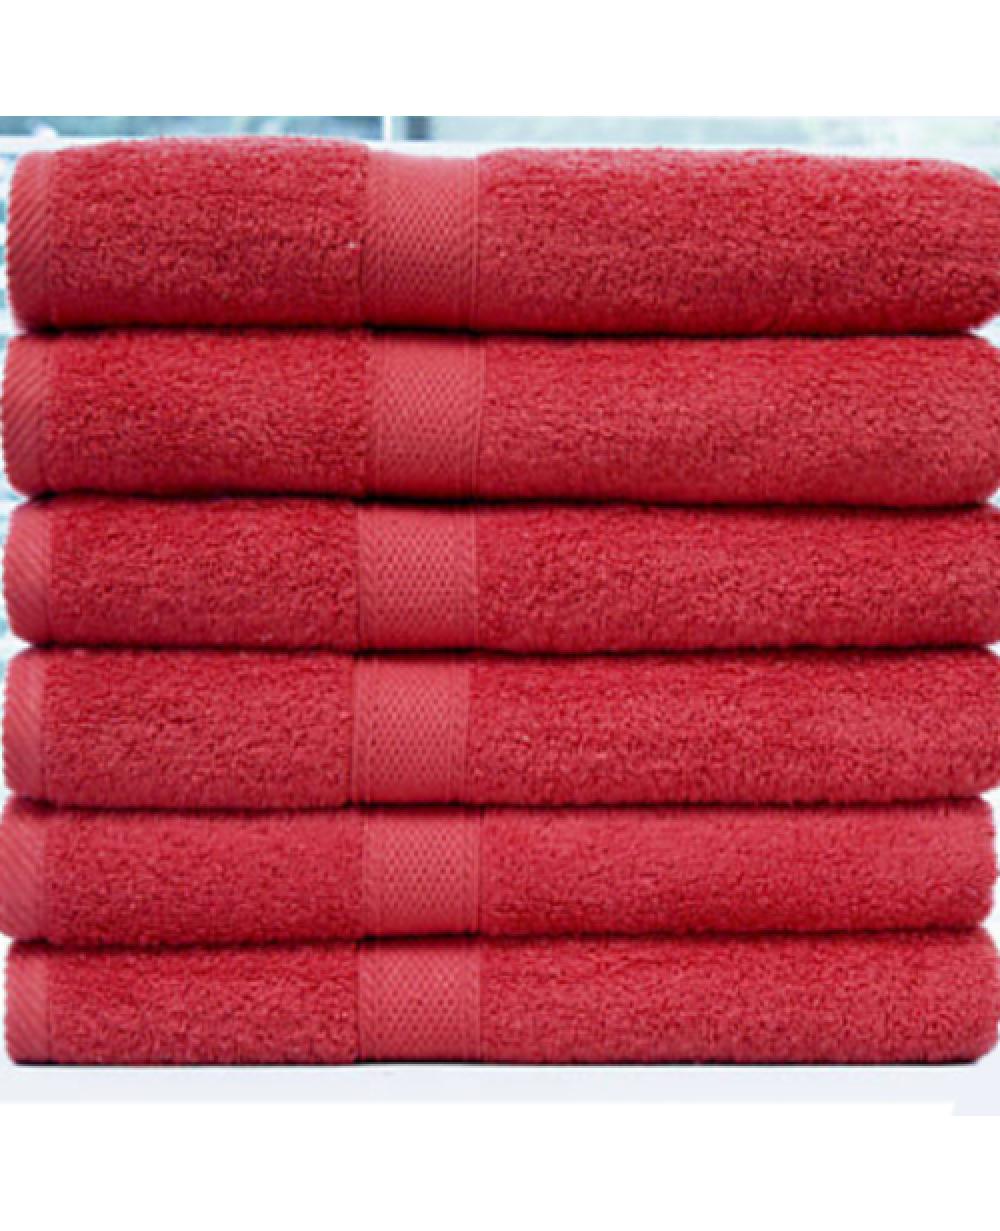 Red Towels Bathroom: Red Bath Towel